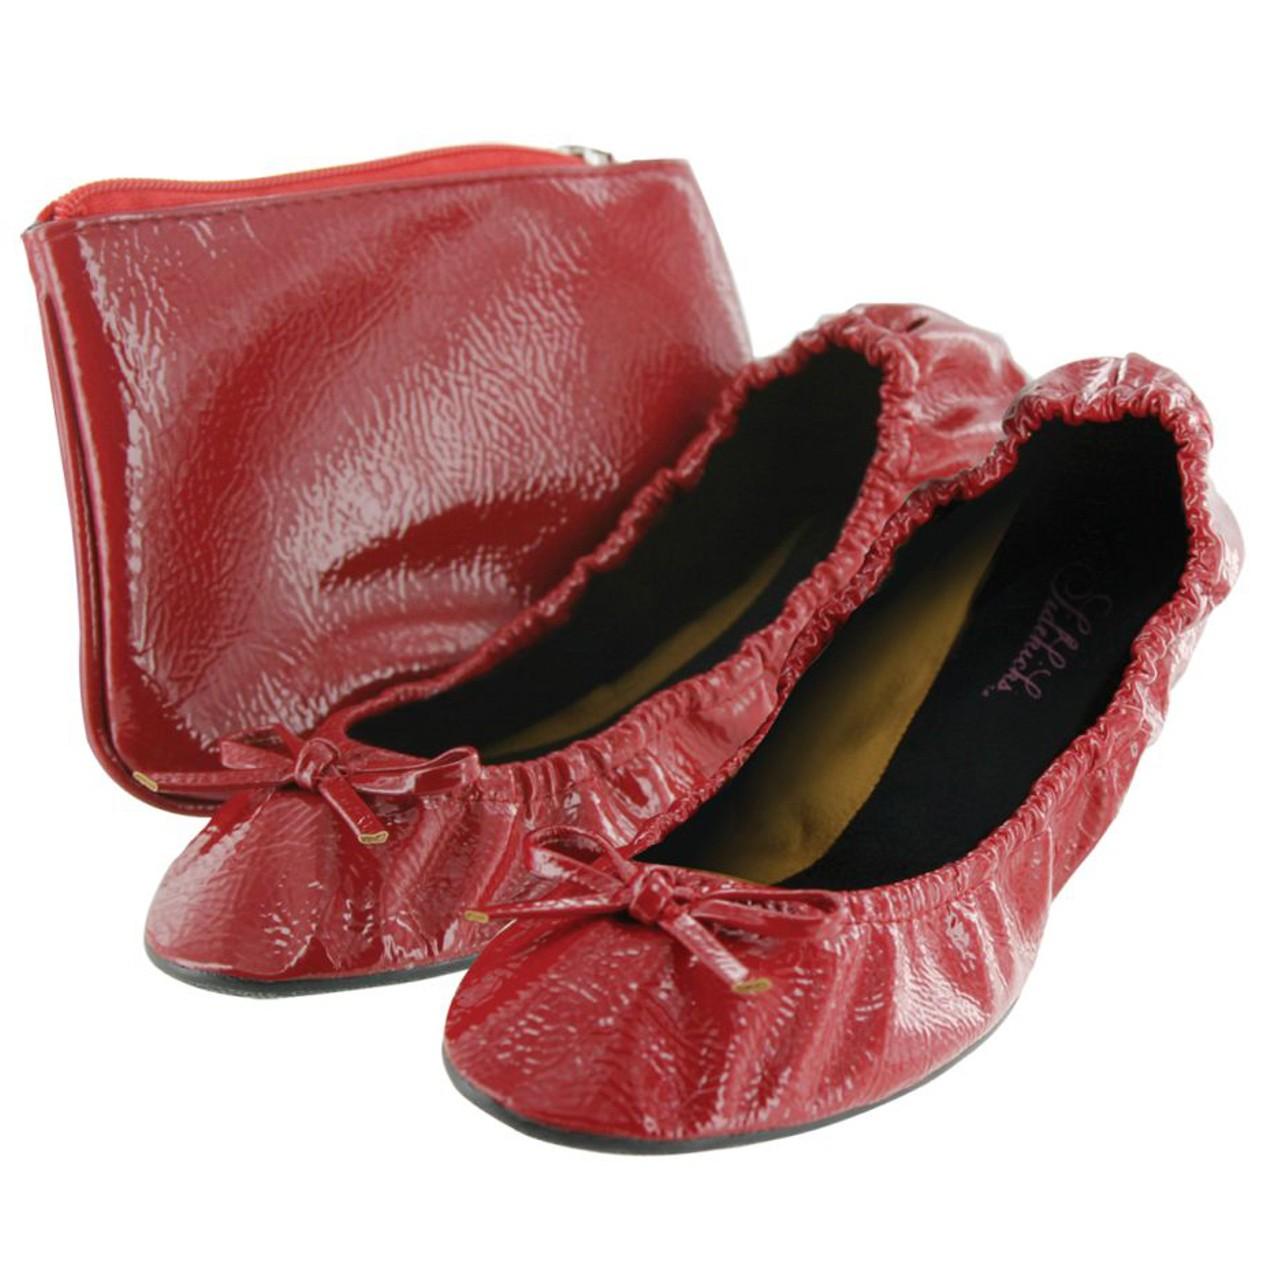 2aff04980 Sidekicks Women's Foldable Flats with Carrying Case - Tanga